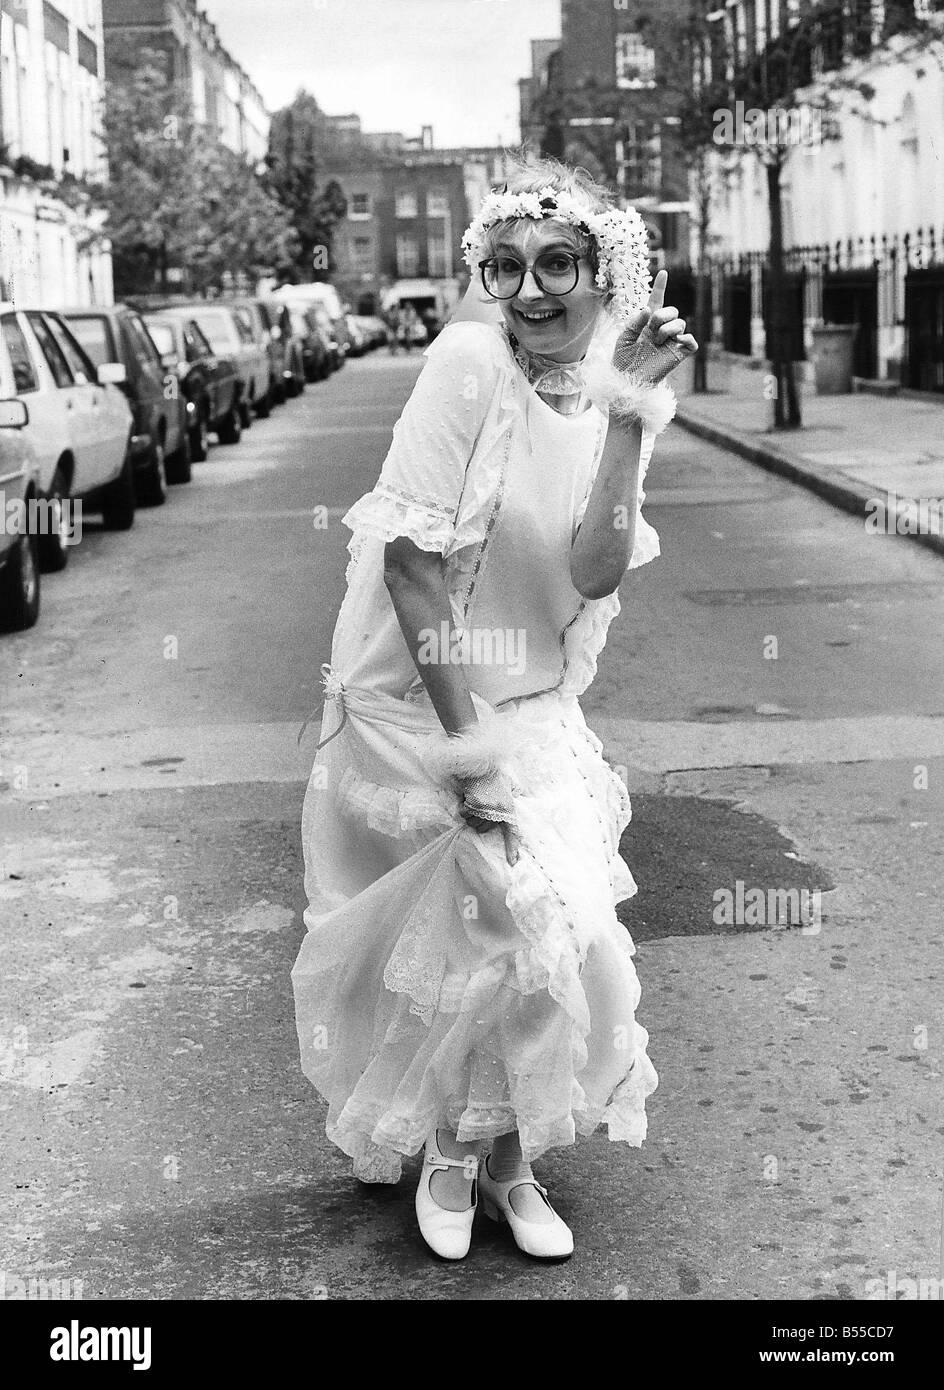 Su Pollard TV Actress From Hi De In Wedding Dress Street On Day To Peter Keogh 40